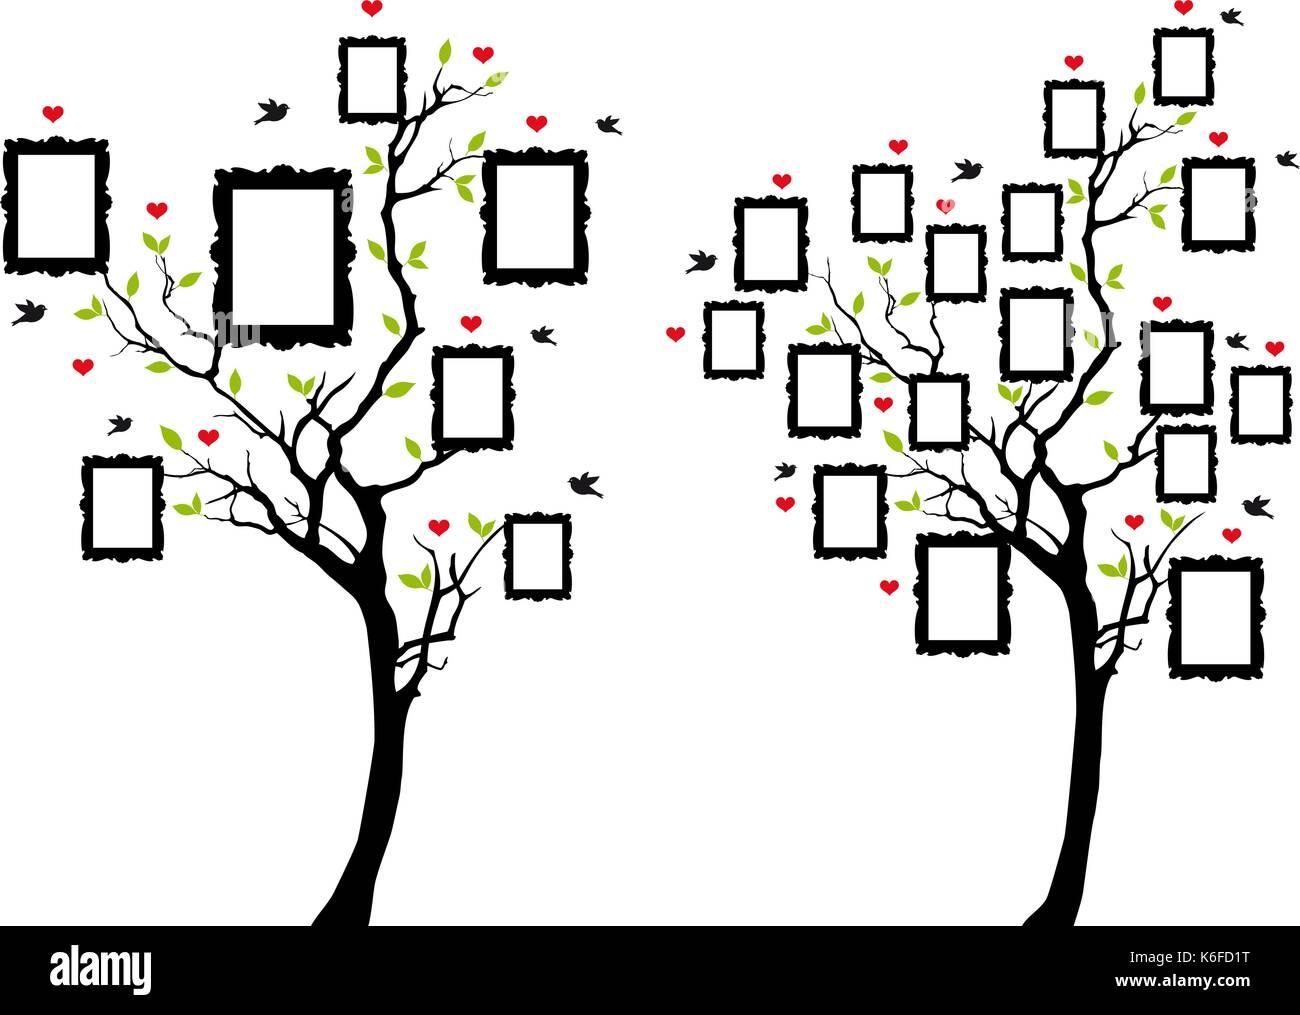 Stammbaum mit leeren Bilderrahmen, Vektor, Abbildung Vektor ...